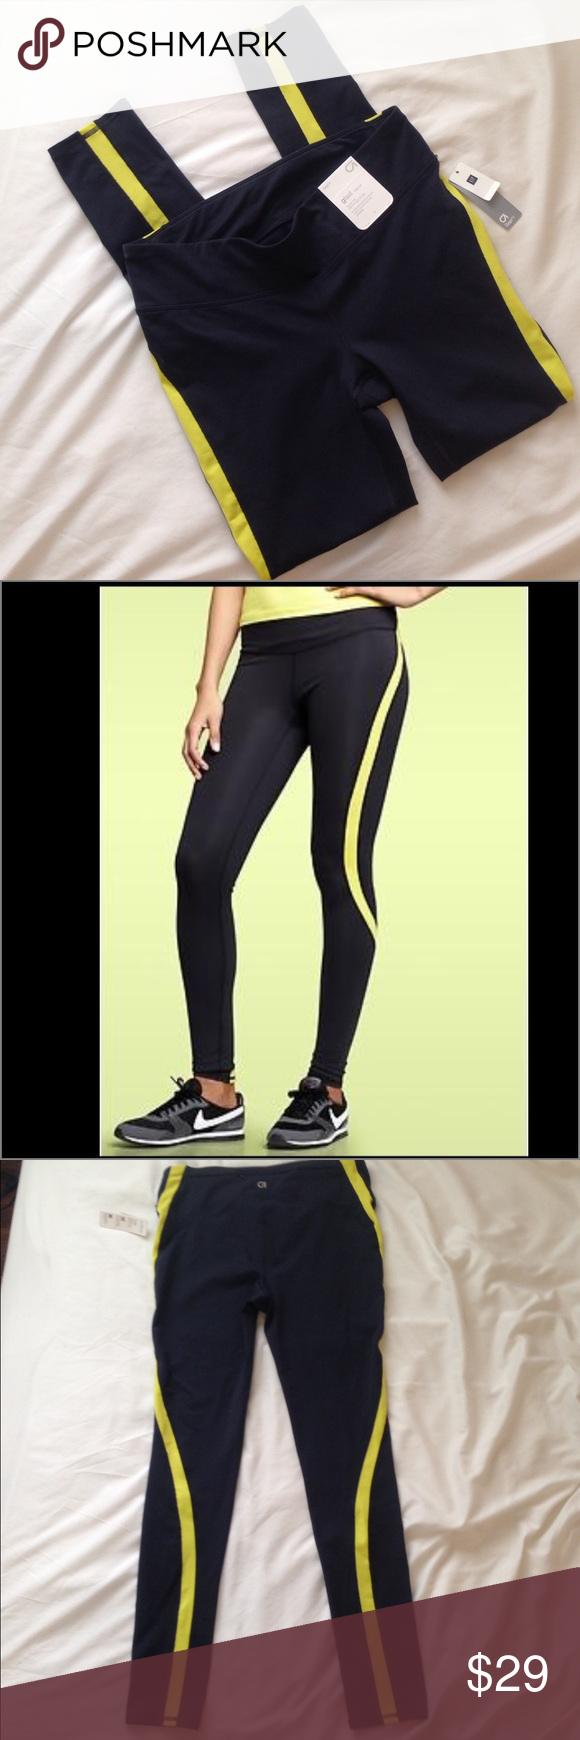 GapFit gFast colorblock leggings Regular rise, fitted through the leg, contoured slimming seams, built-in pocket secures valuables. Gap Pants Leggings